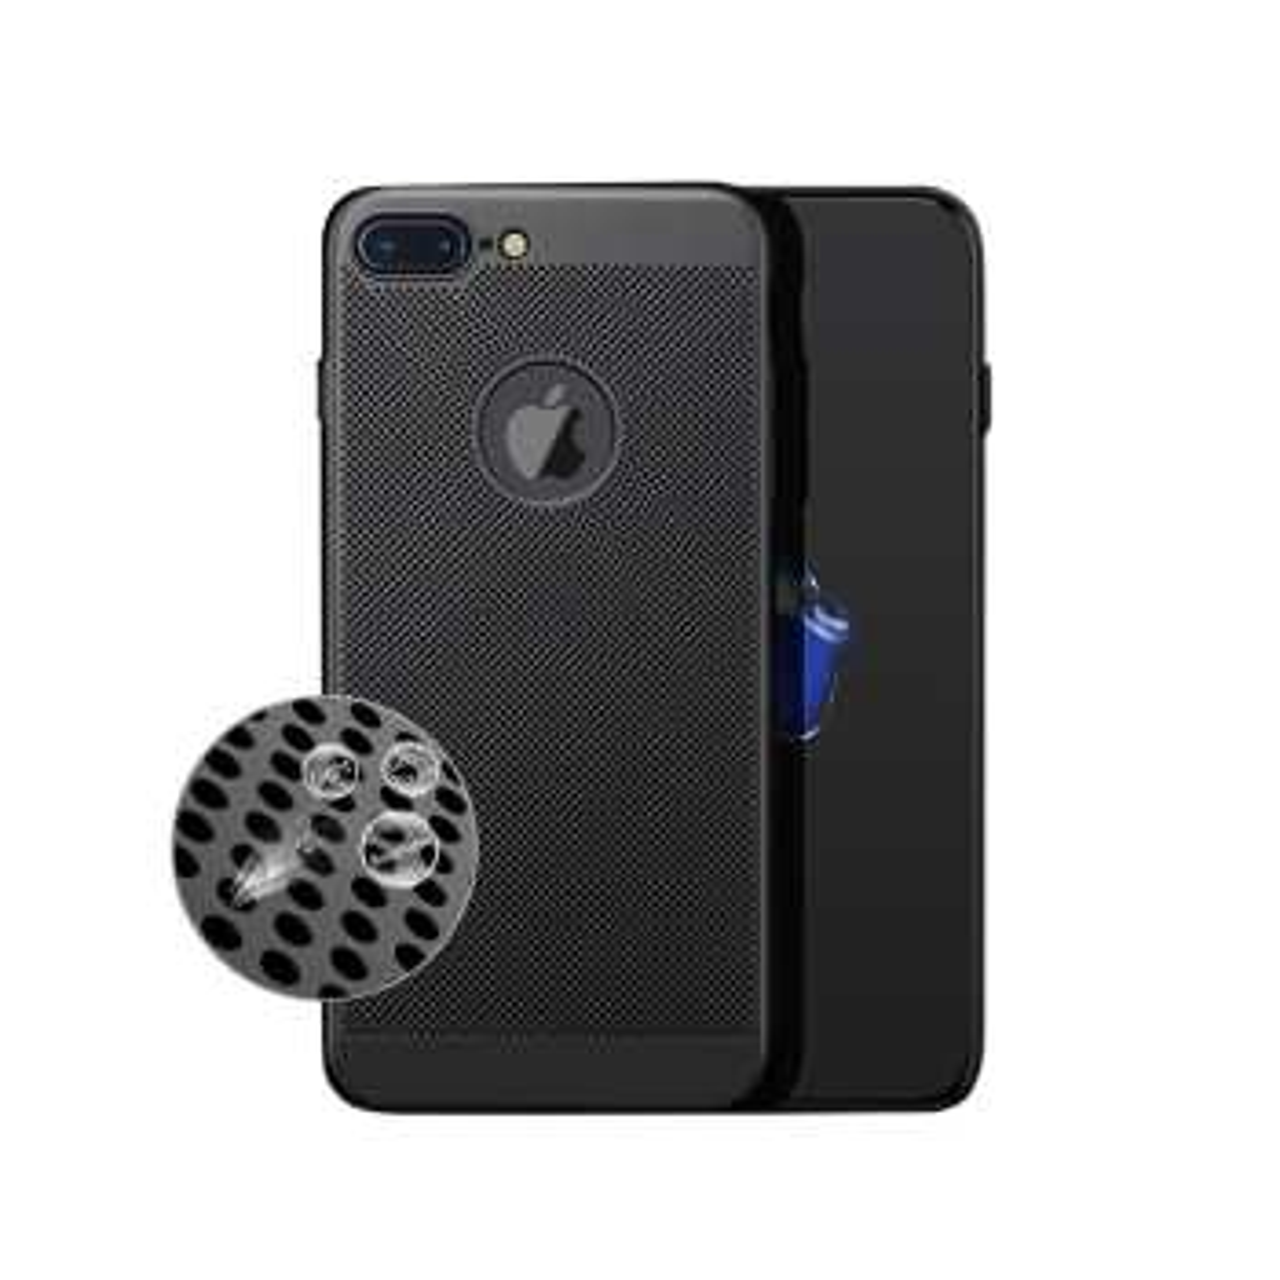 کاور آیپکی مدل Hard Mash مناسب برای گوشی iPhone 7 Plus